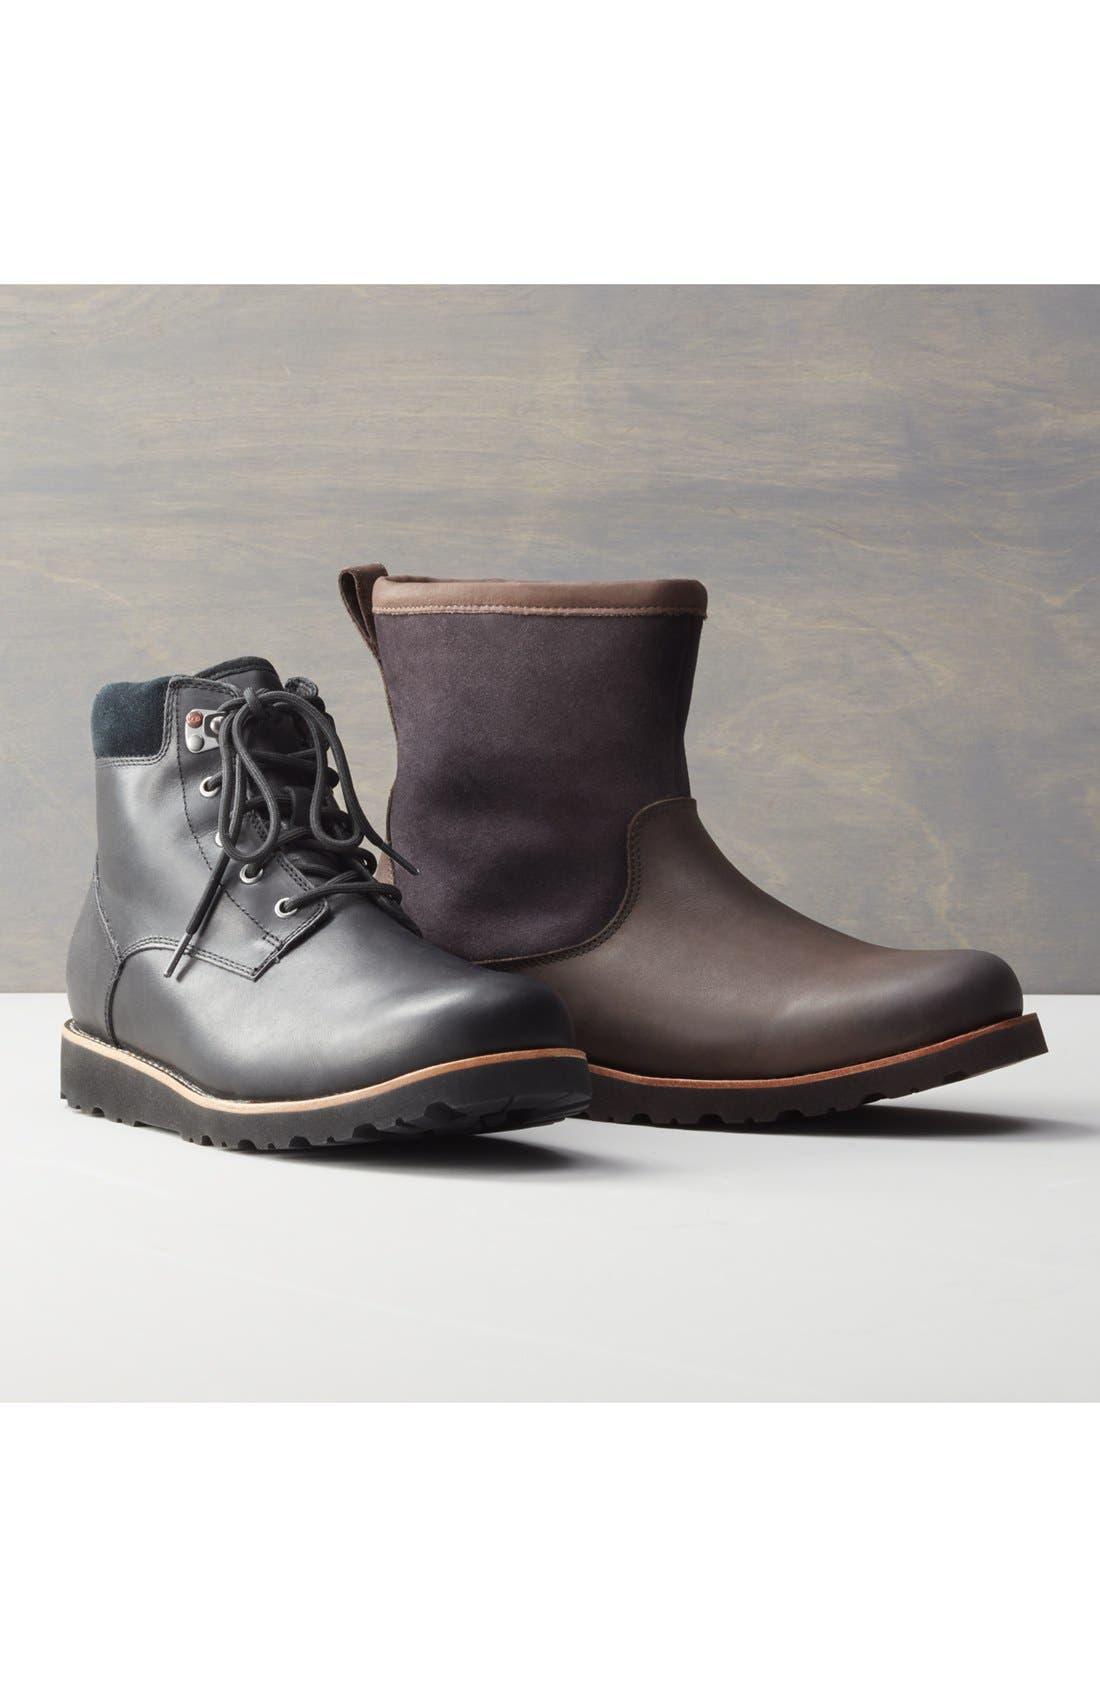 Seton Waterproof Chukka Boot,                             Alternate thumbnail 6, color,                             STOUT